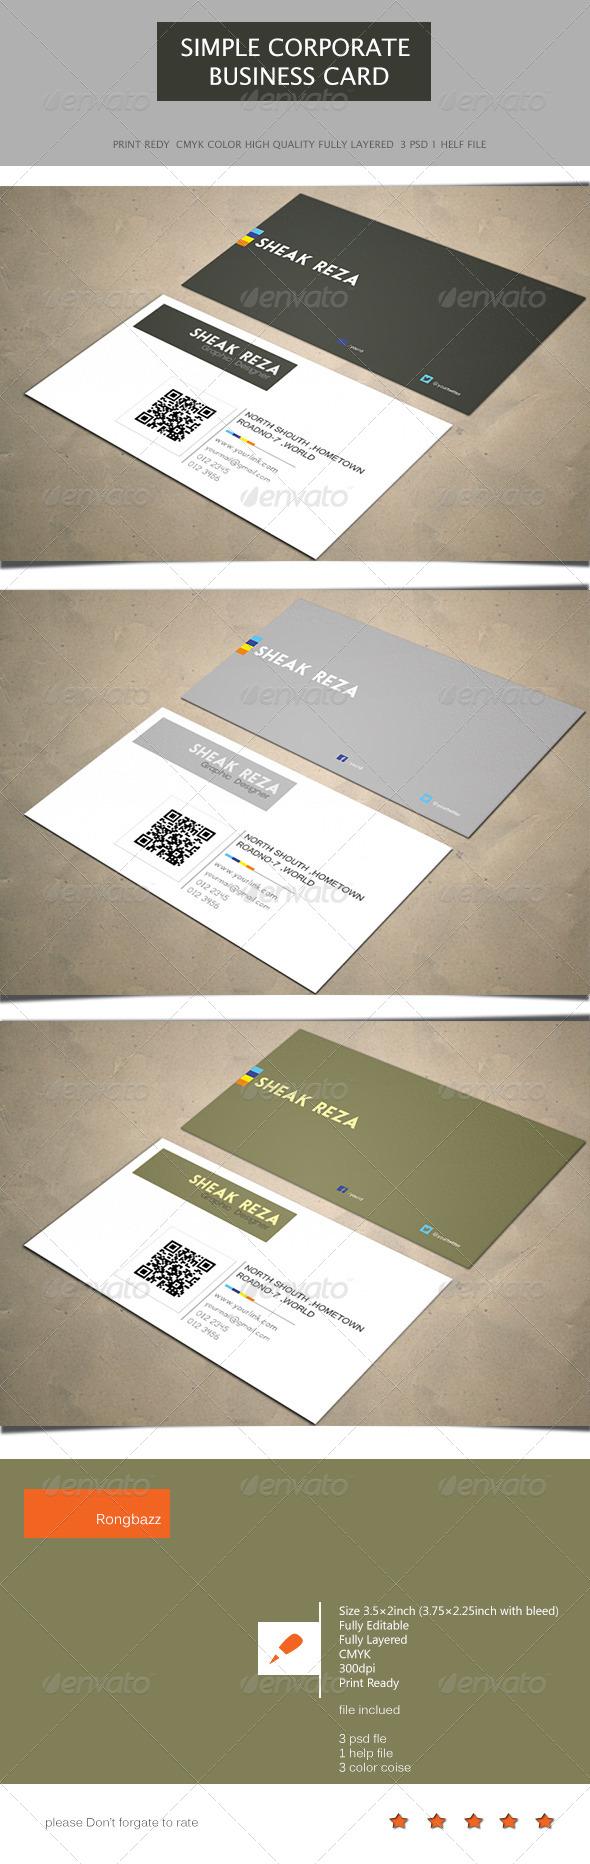 Simple Corporate Business Card 1.0 - Corporate Business Cards